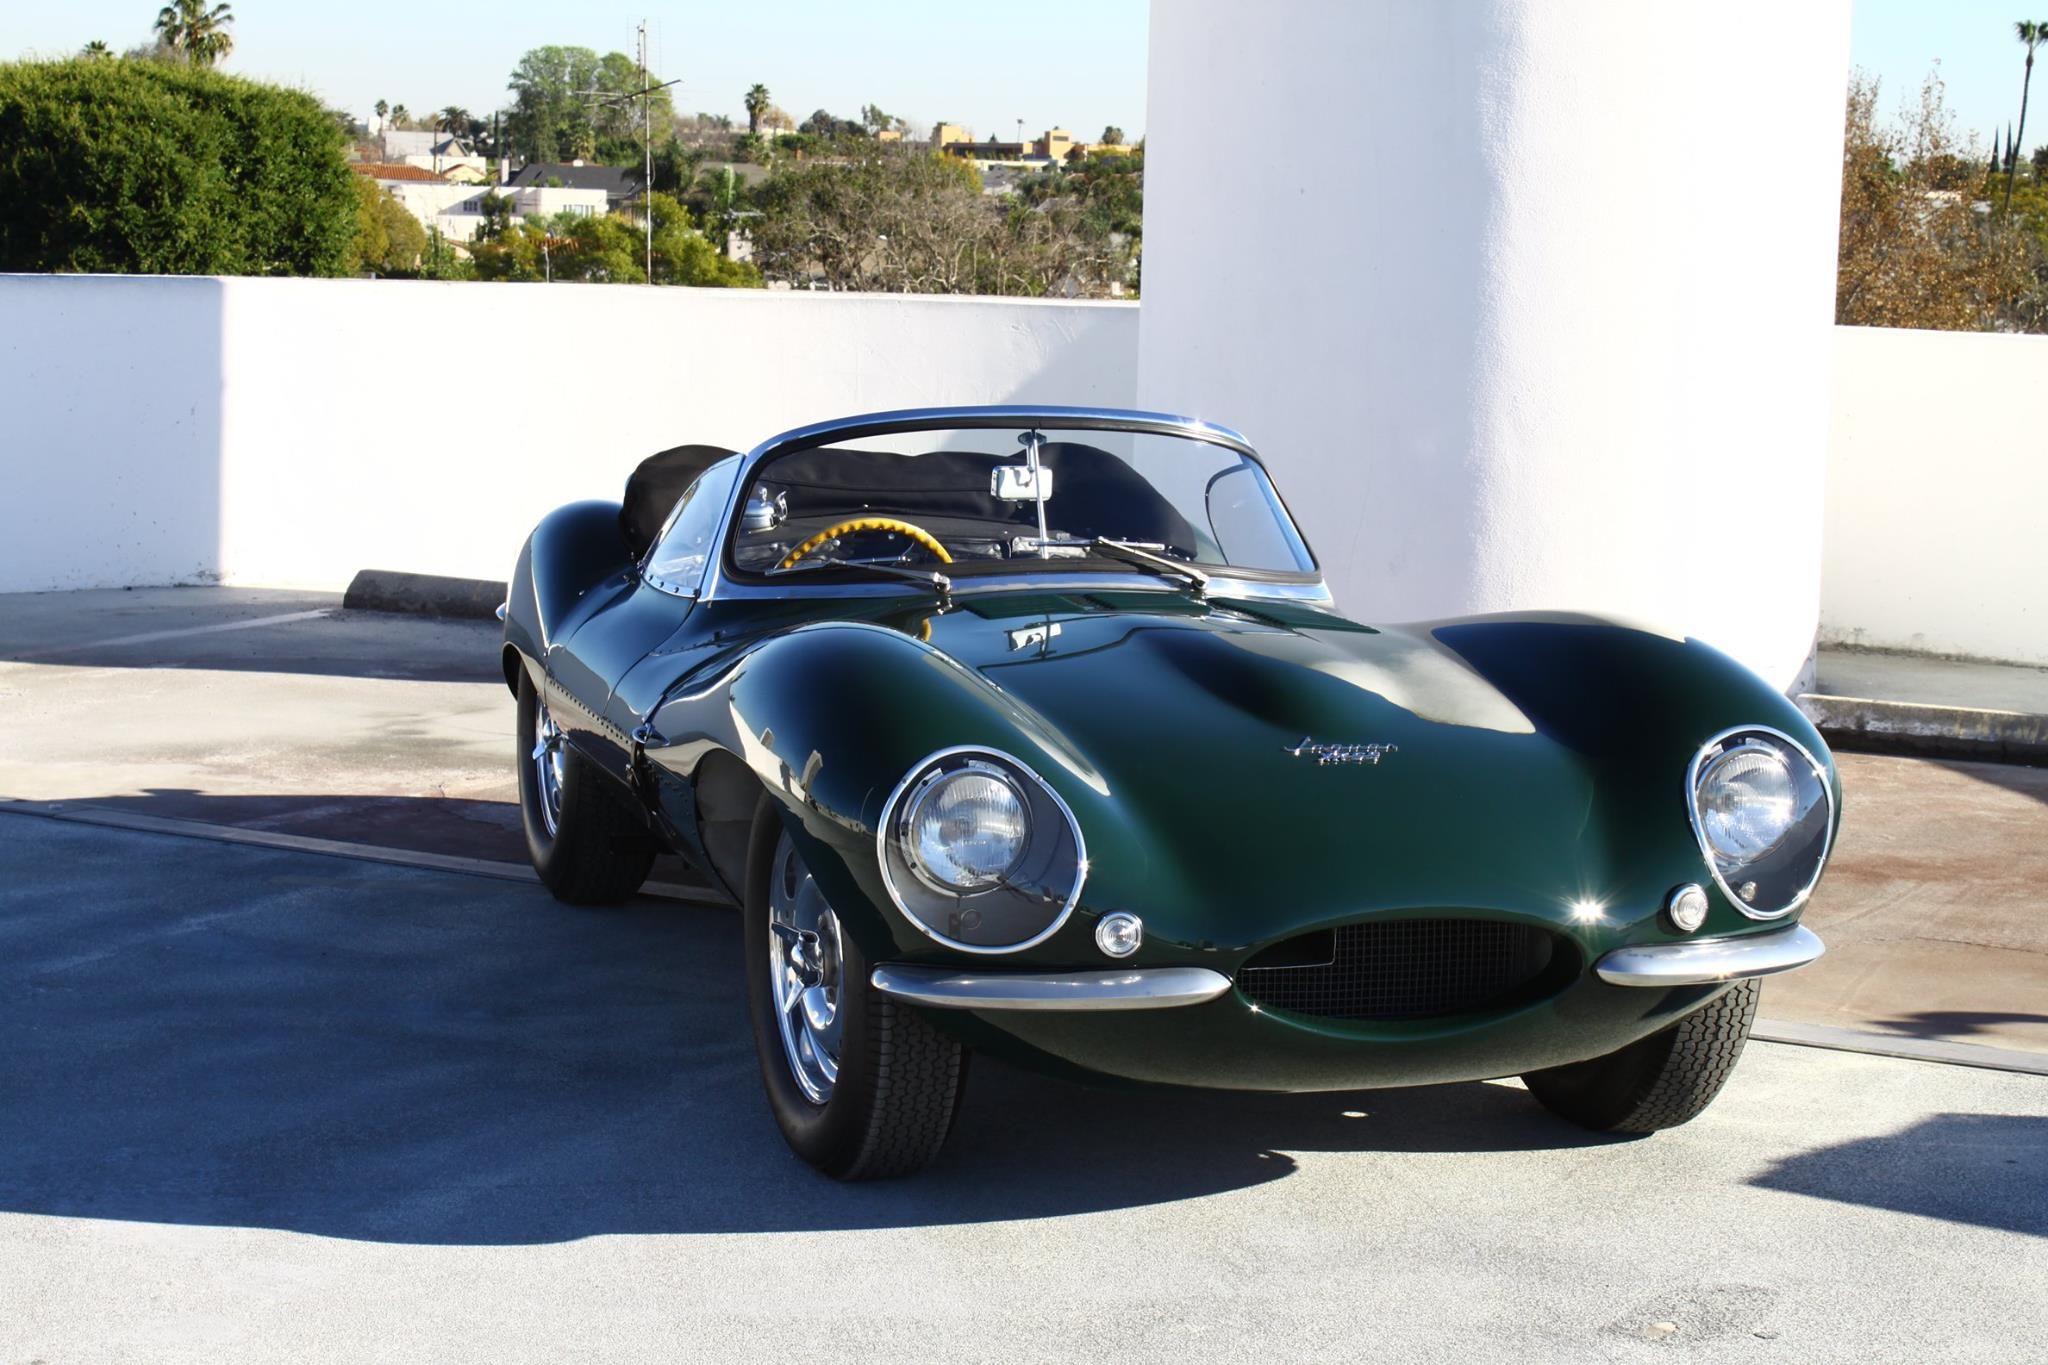 Steve Mcqueen 1957 Jaguar Xkss Jaguars Jaguar Steve Mcqueen